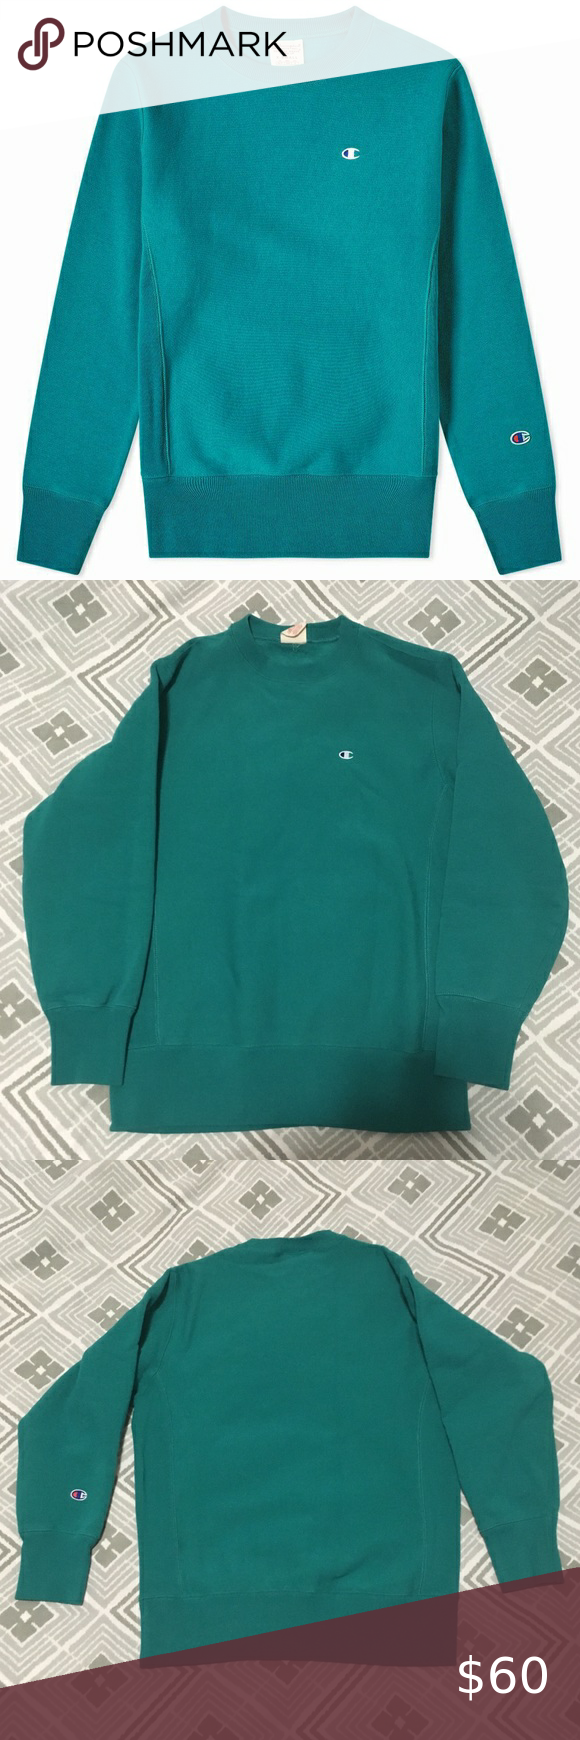 Teal Champion Reverse Weave Warm Up Sweatshirt Champion Reverse Weave Sweatshirts Long Sleeve Tshirt Men [ 1740 x 580 Pixel ]